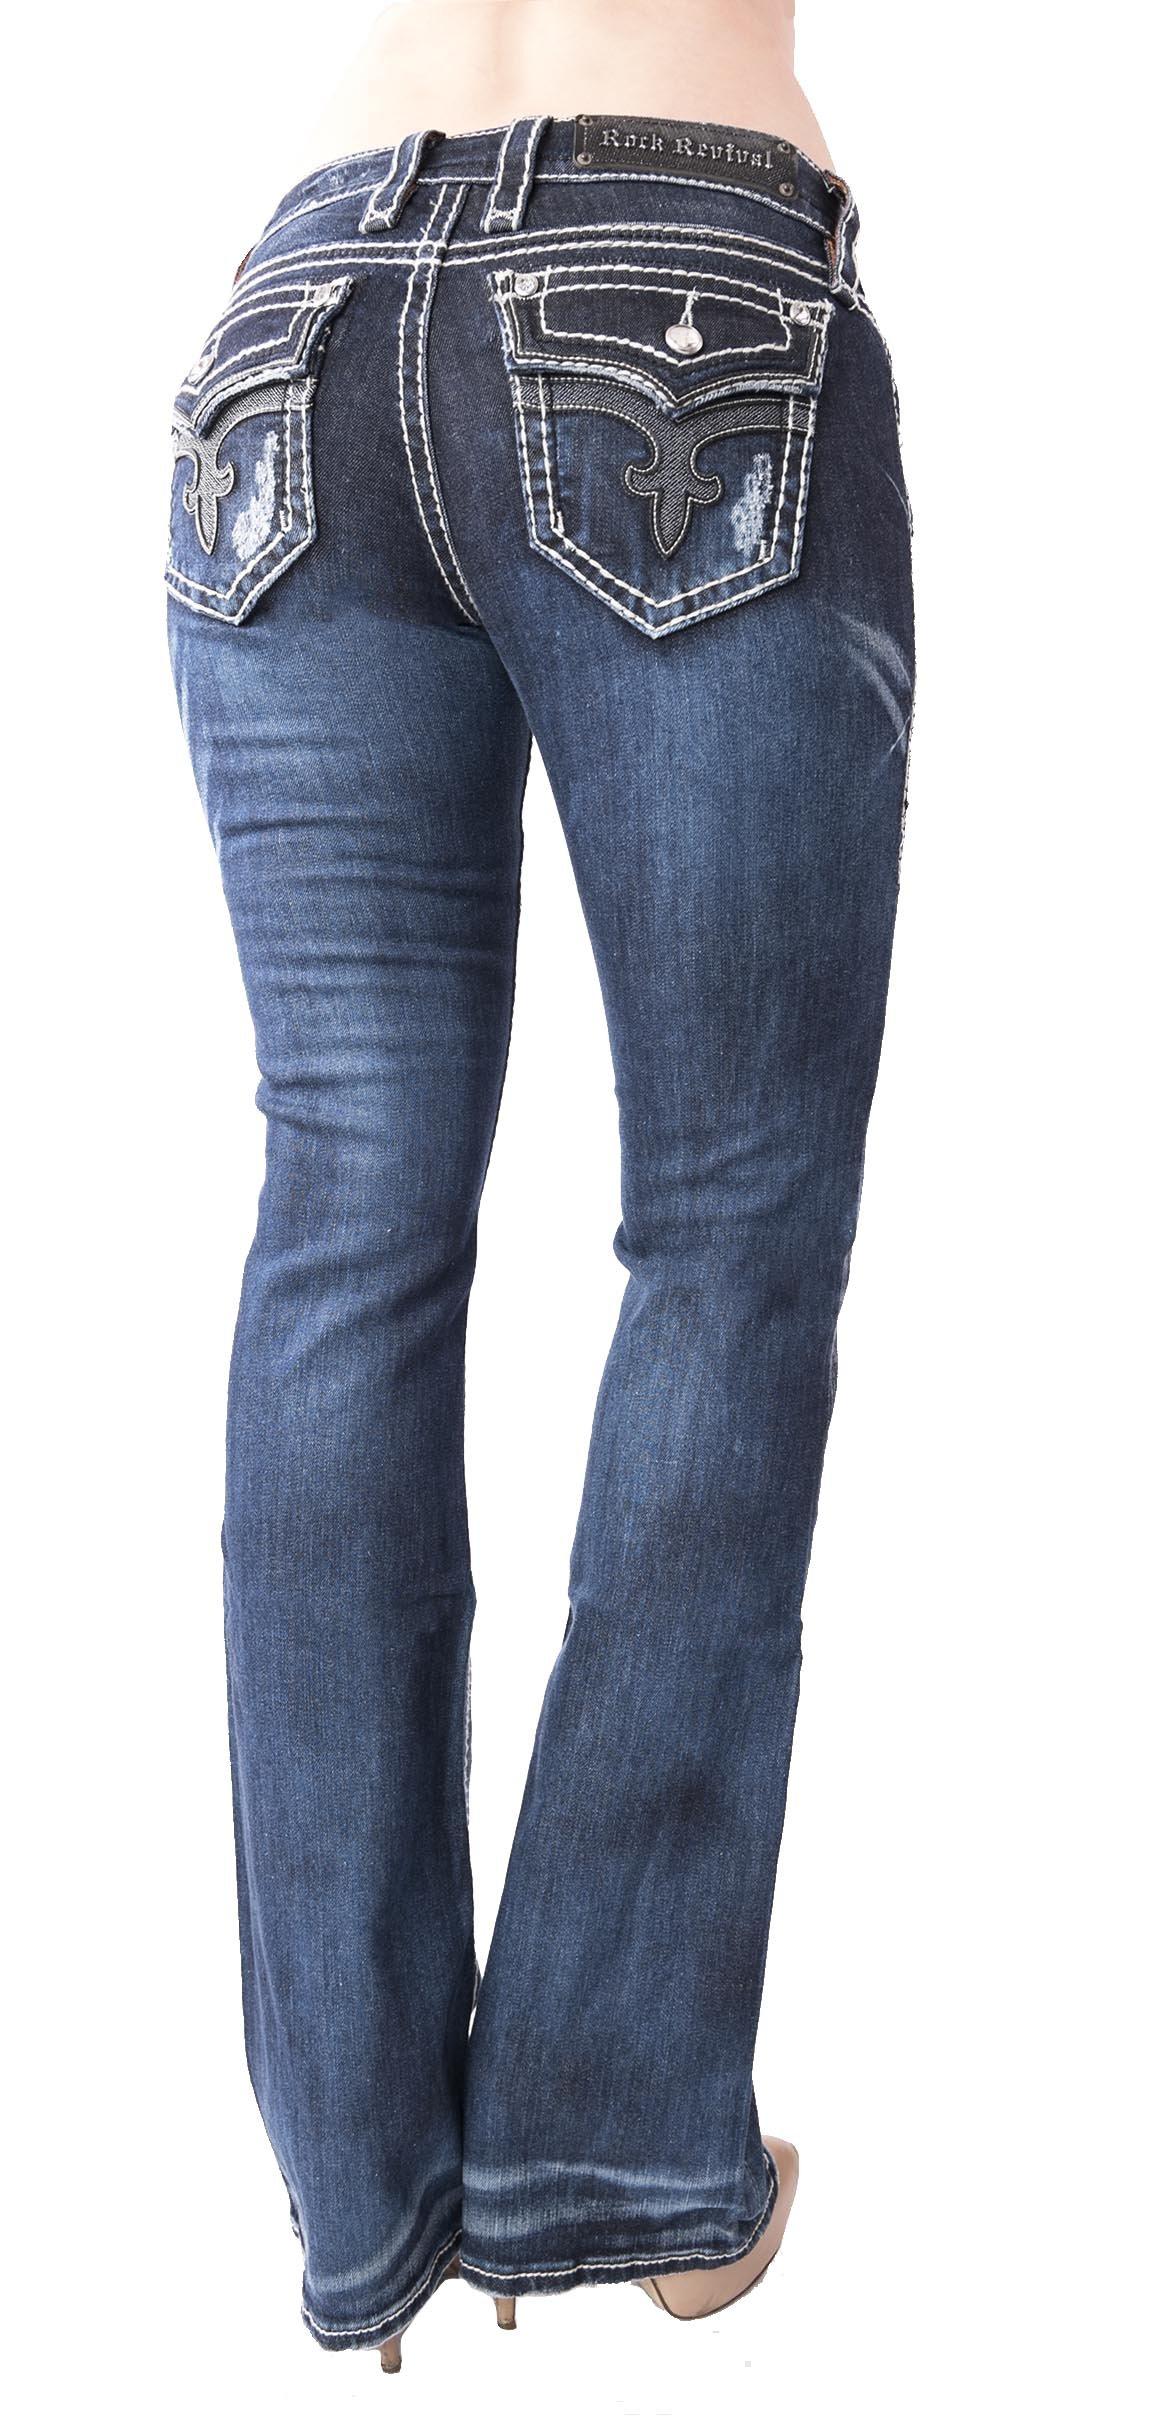 Rock Revival Jeans Women's Boot Cut Flap Pockets Leather Trim 33'' Inseam (25x33)